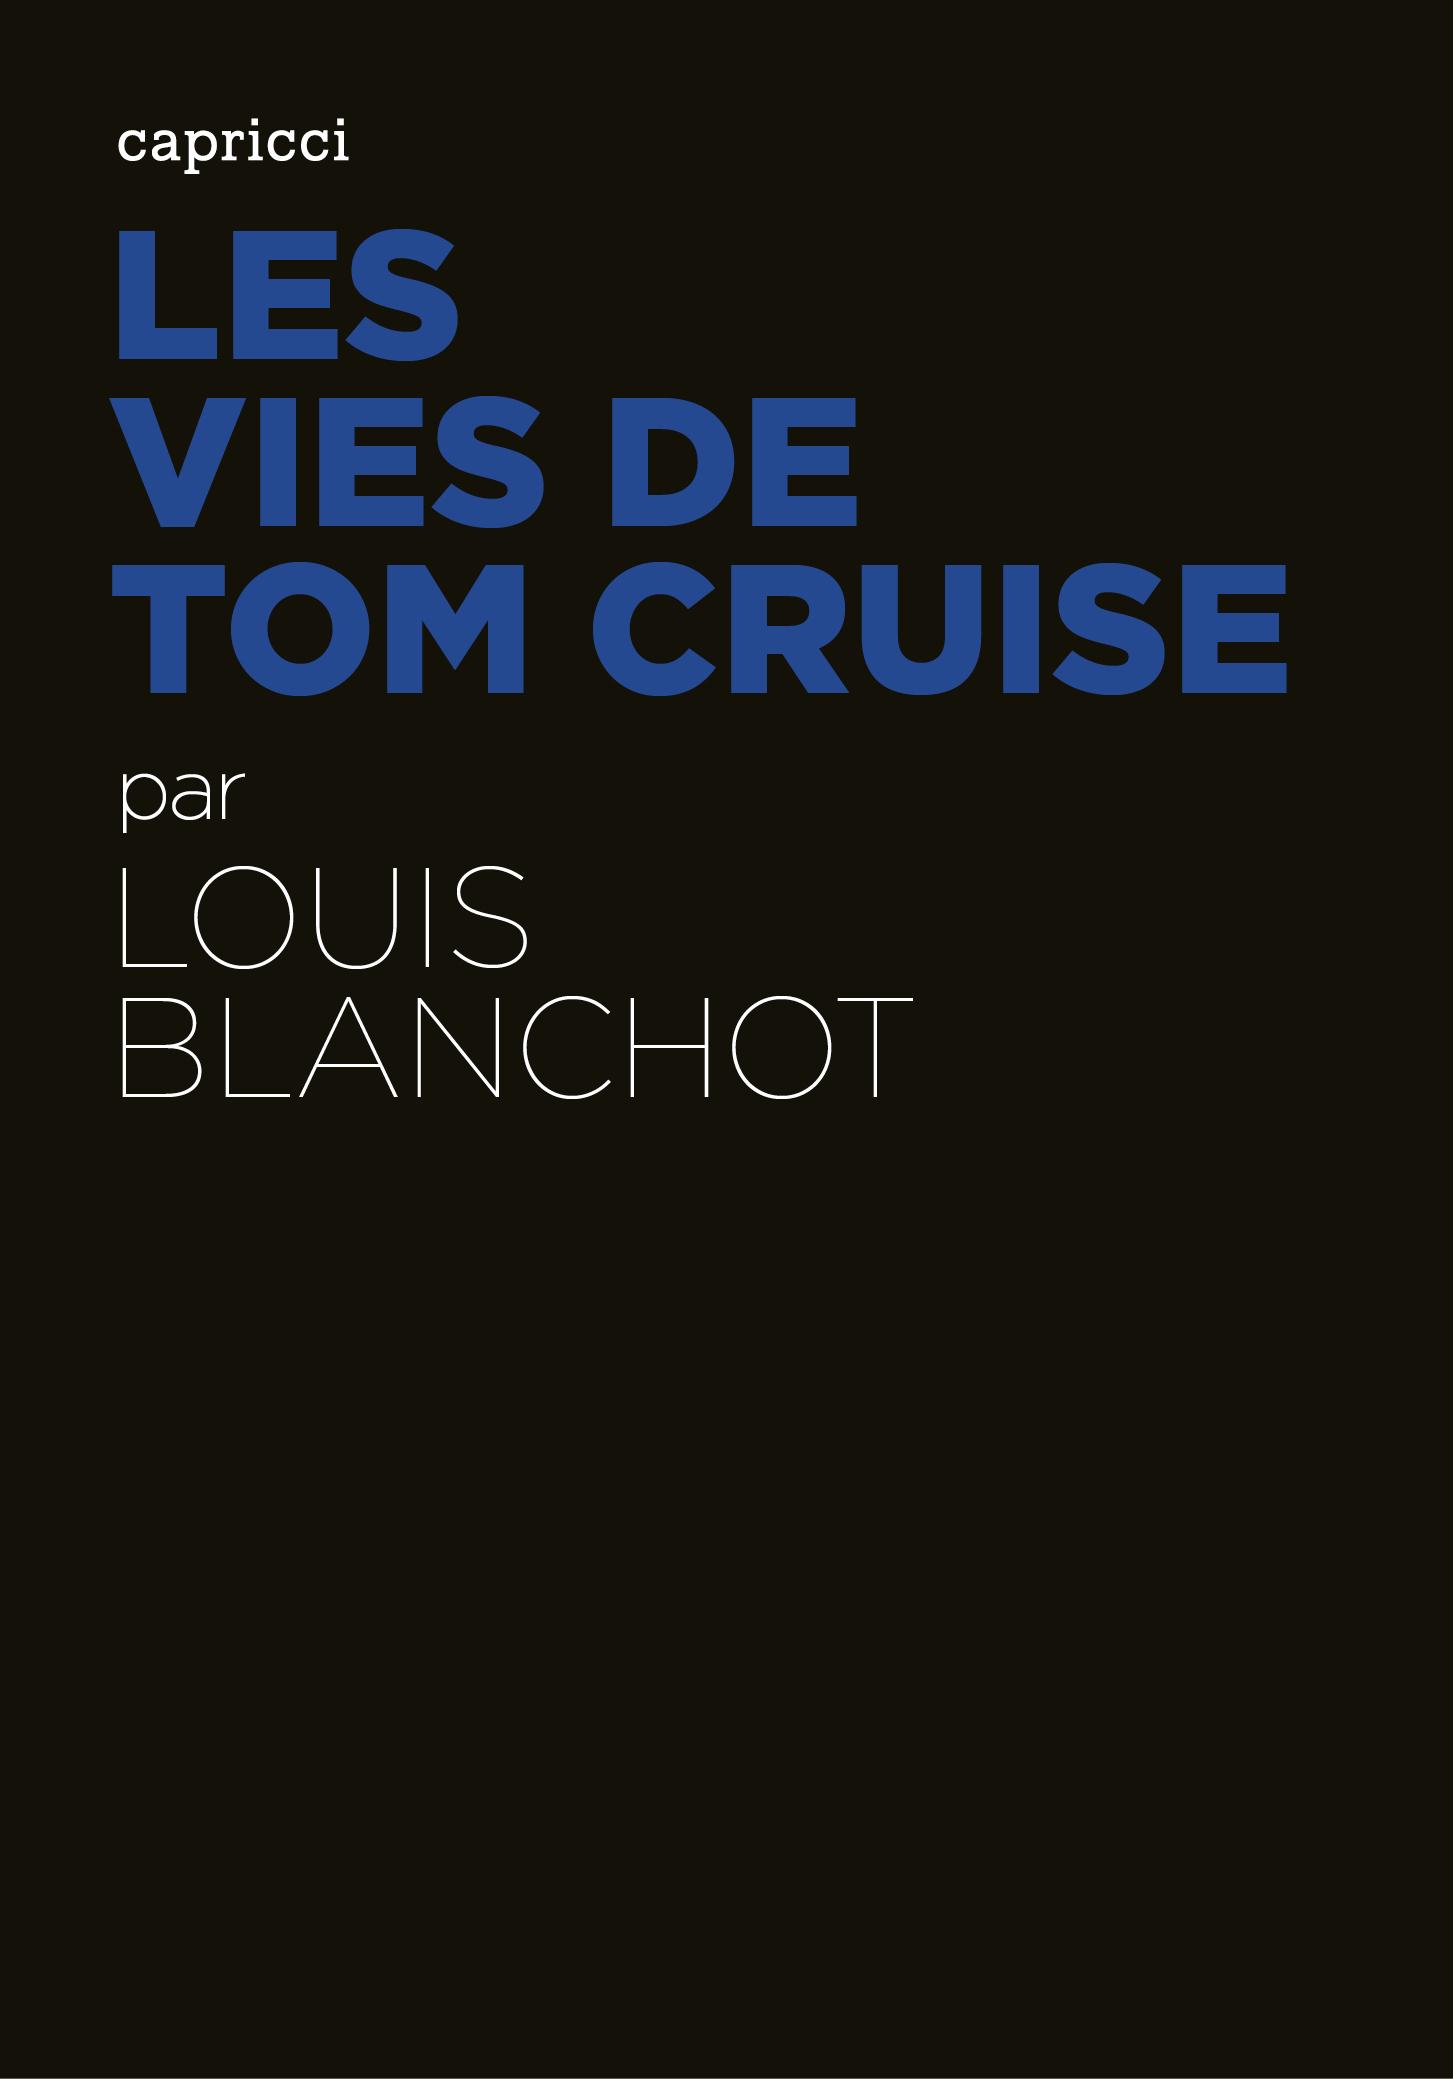 Les Vies de Tom Cruise